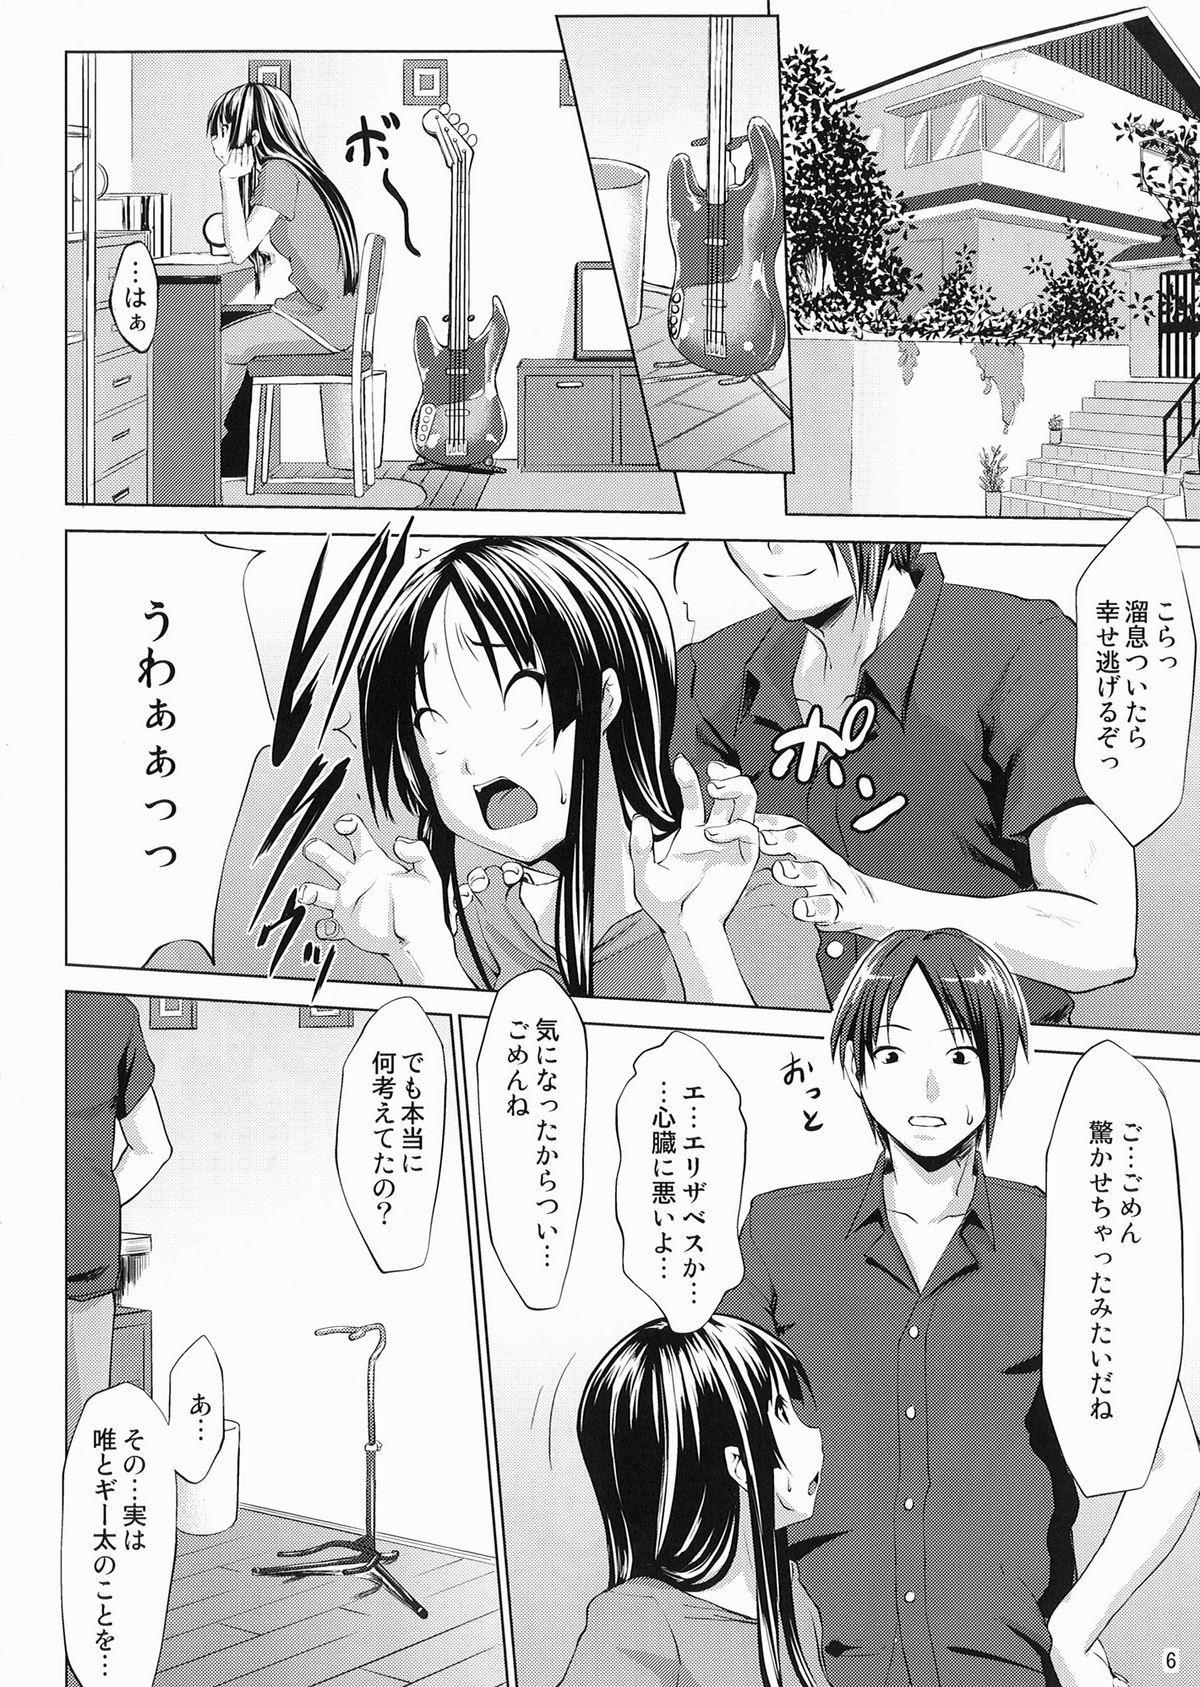 SukiSuki ☆ Elizabeth 5